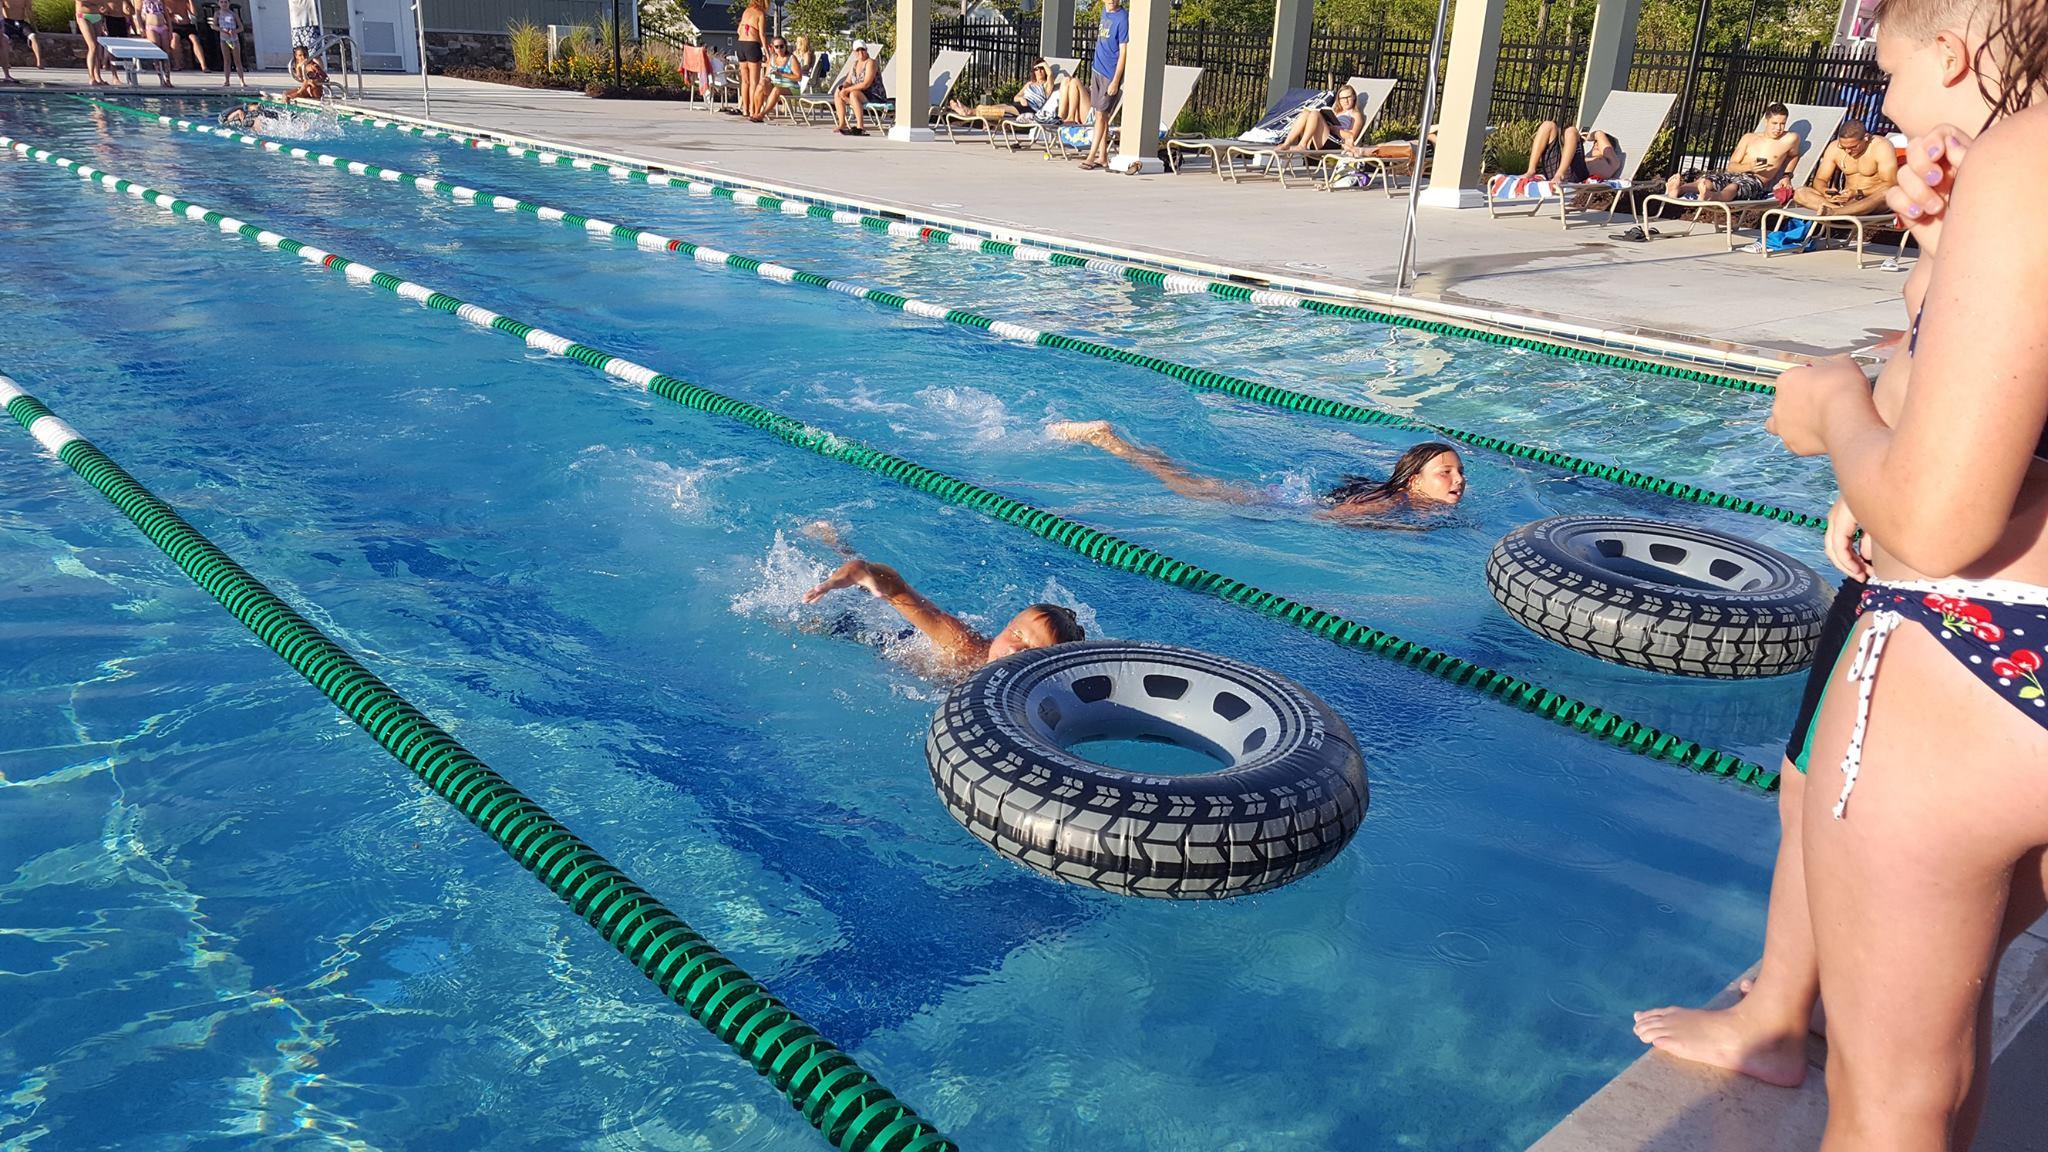 Kids swimming in the lap pool the Magnolia Green Aquatic Center in Moseley, VA